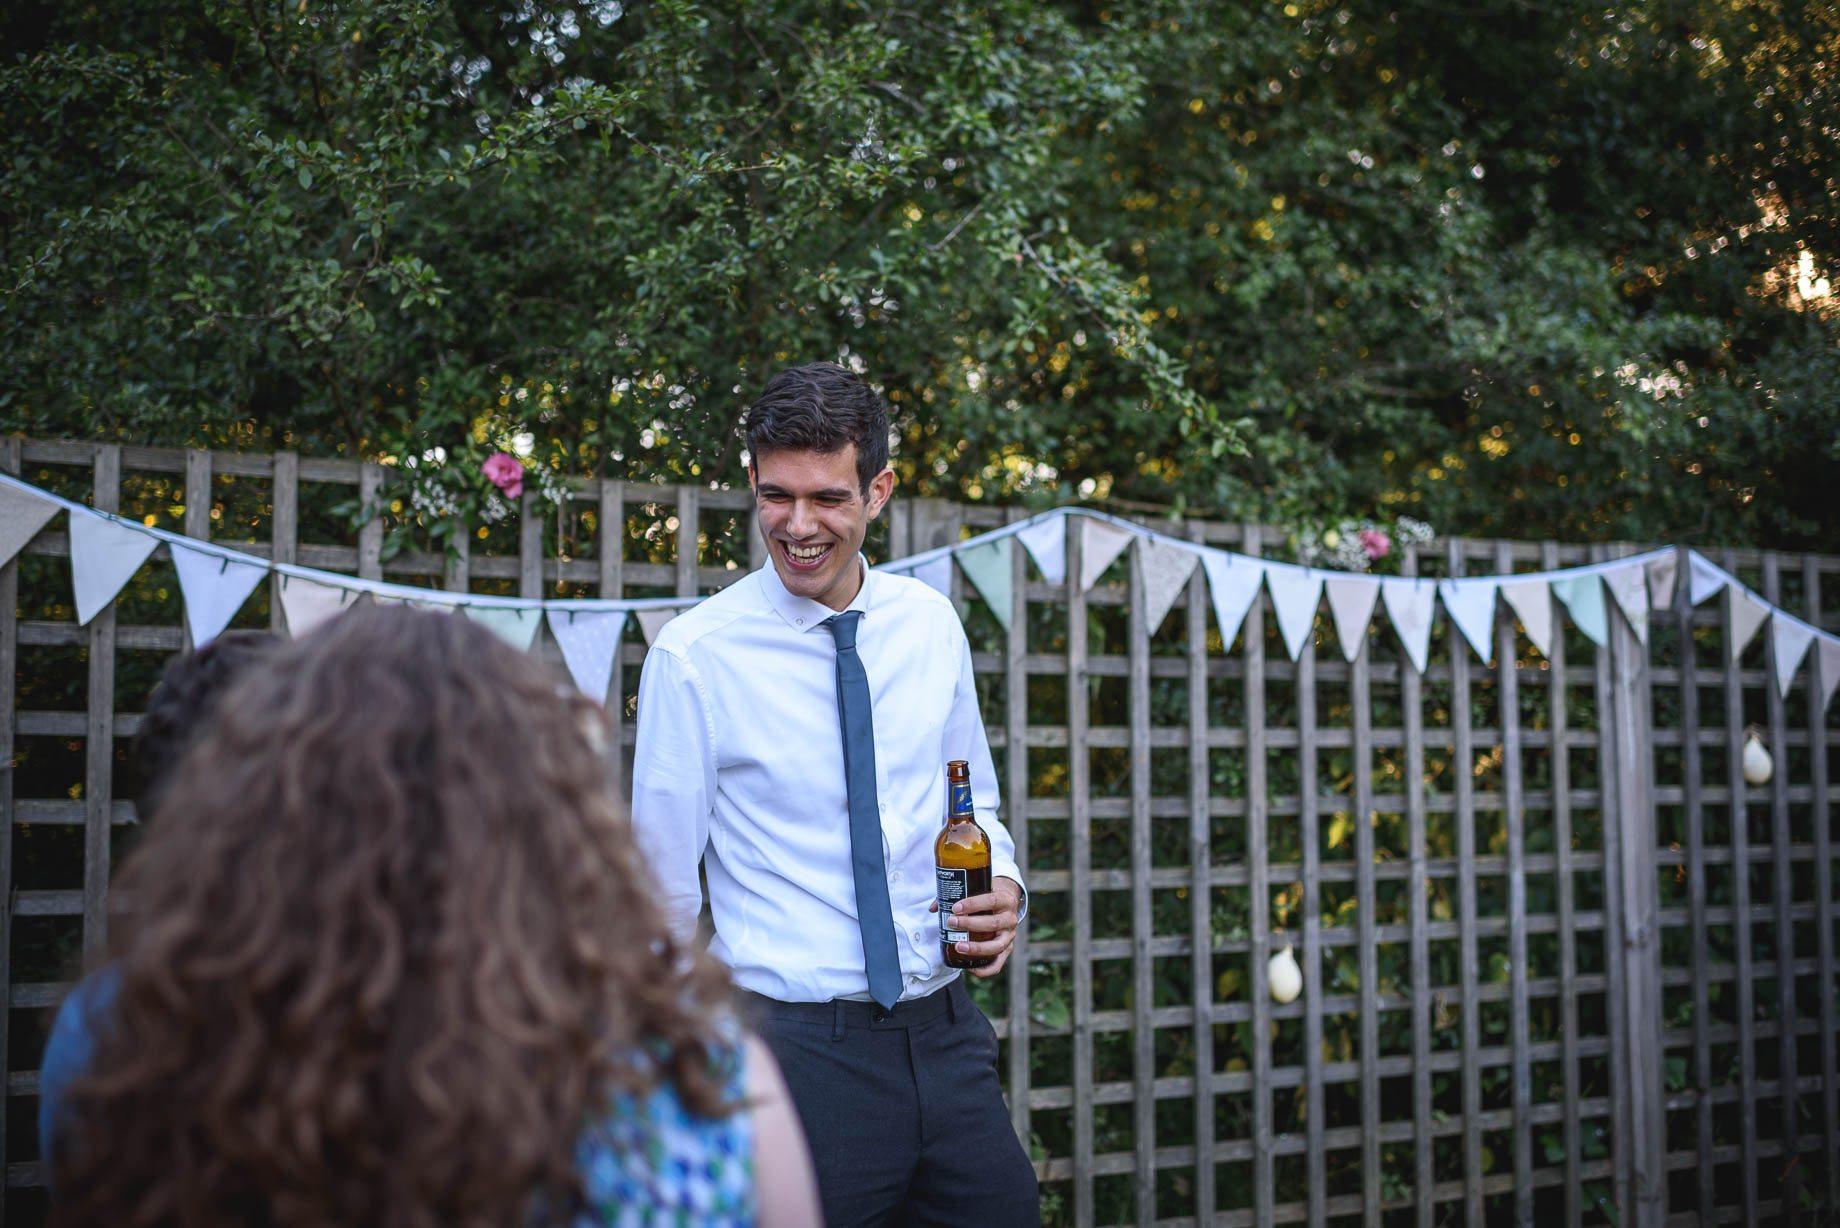 Gildings Barn wedding photography - Sarah and Steve (170 of 190)